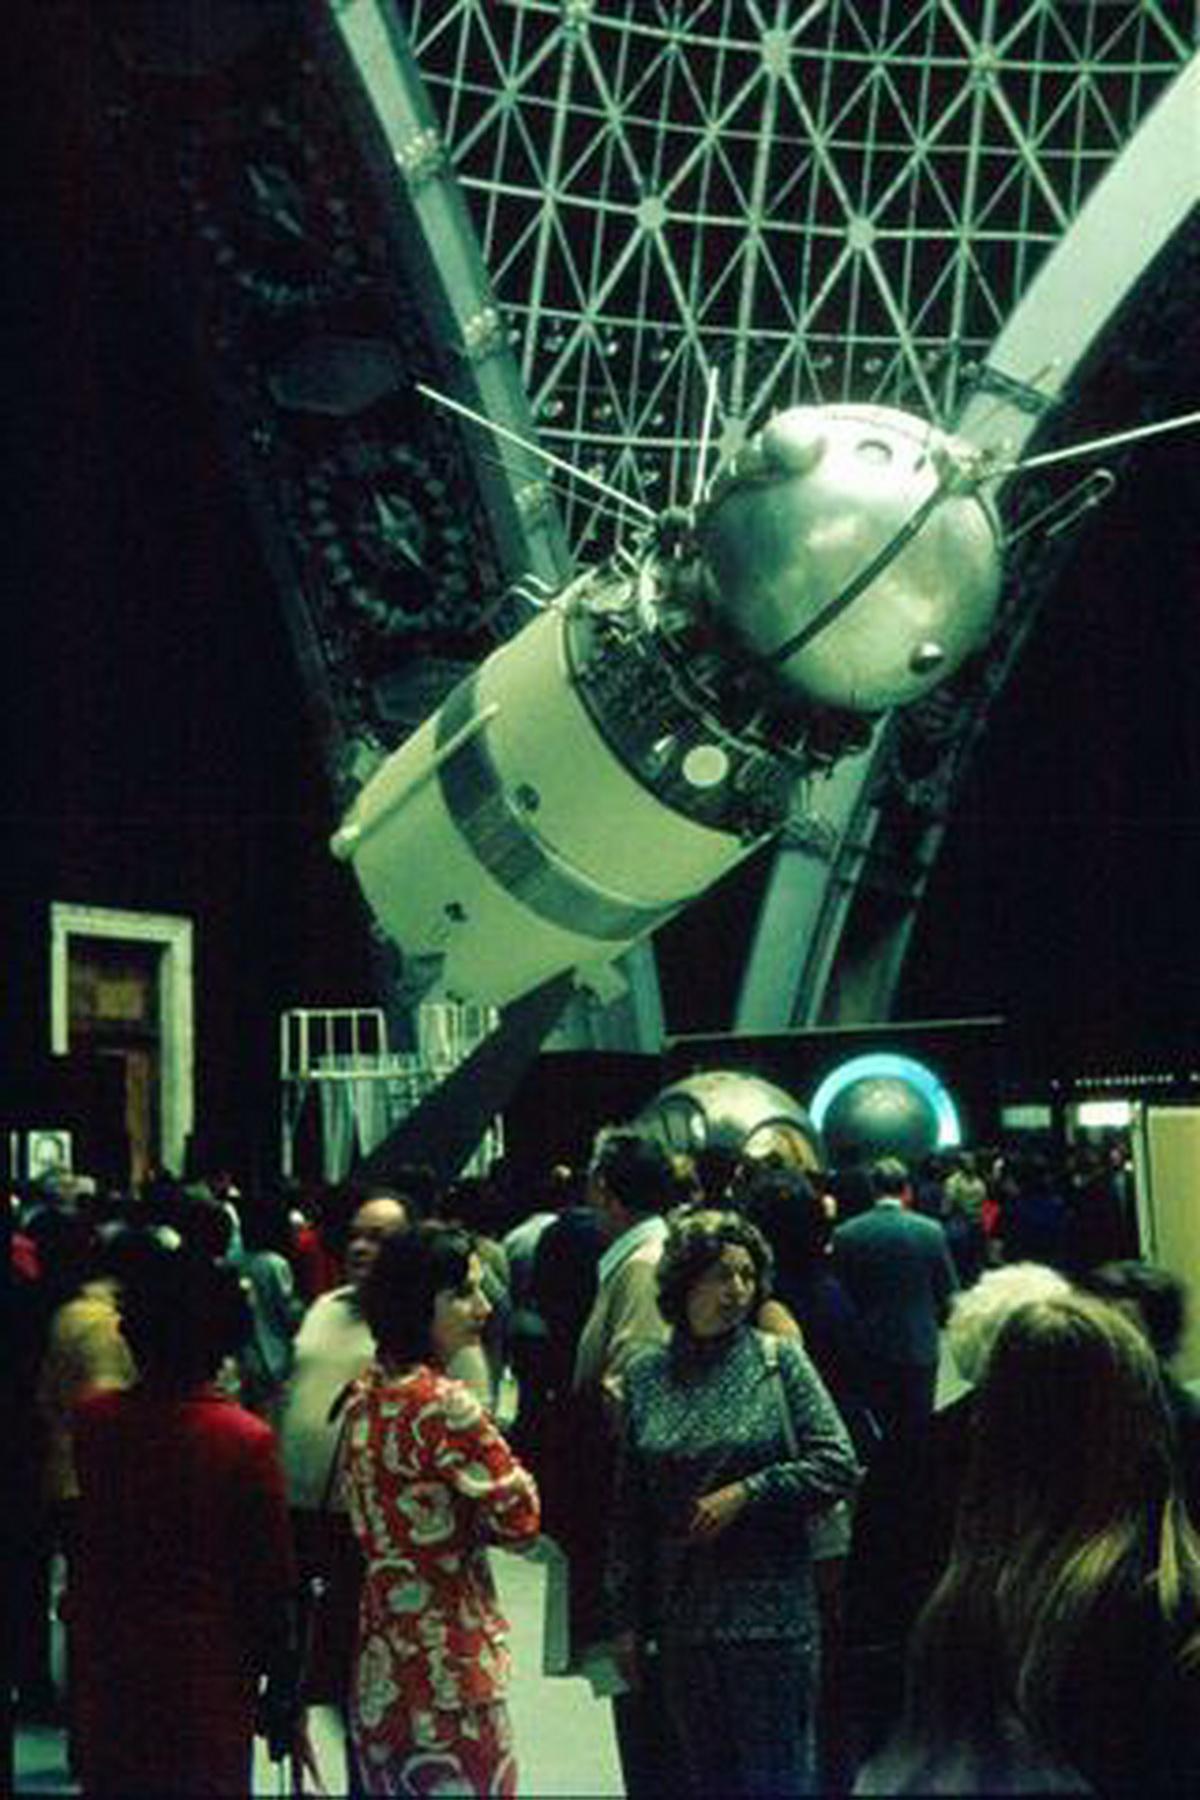 ... und Sputnik 2